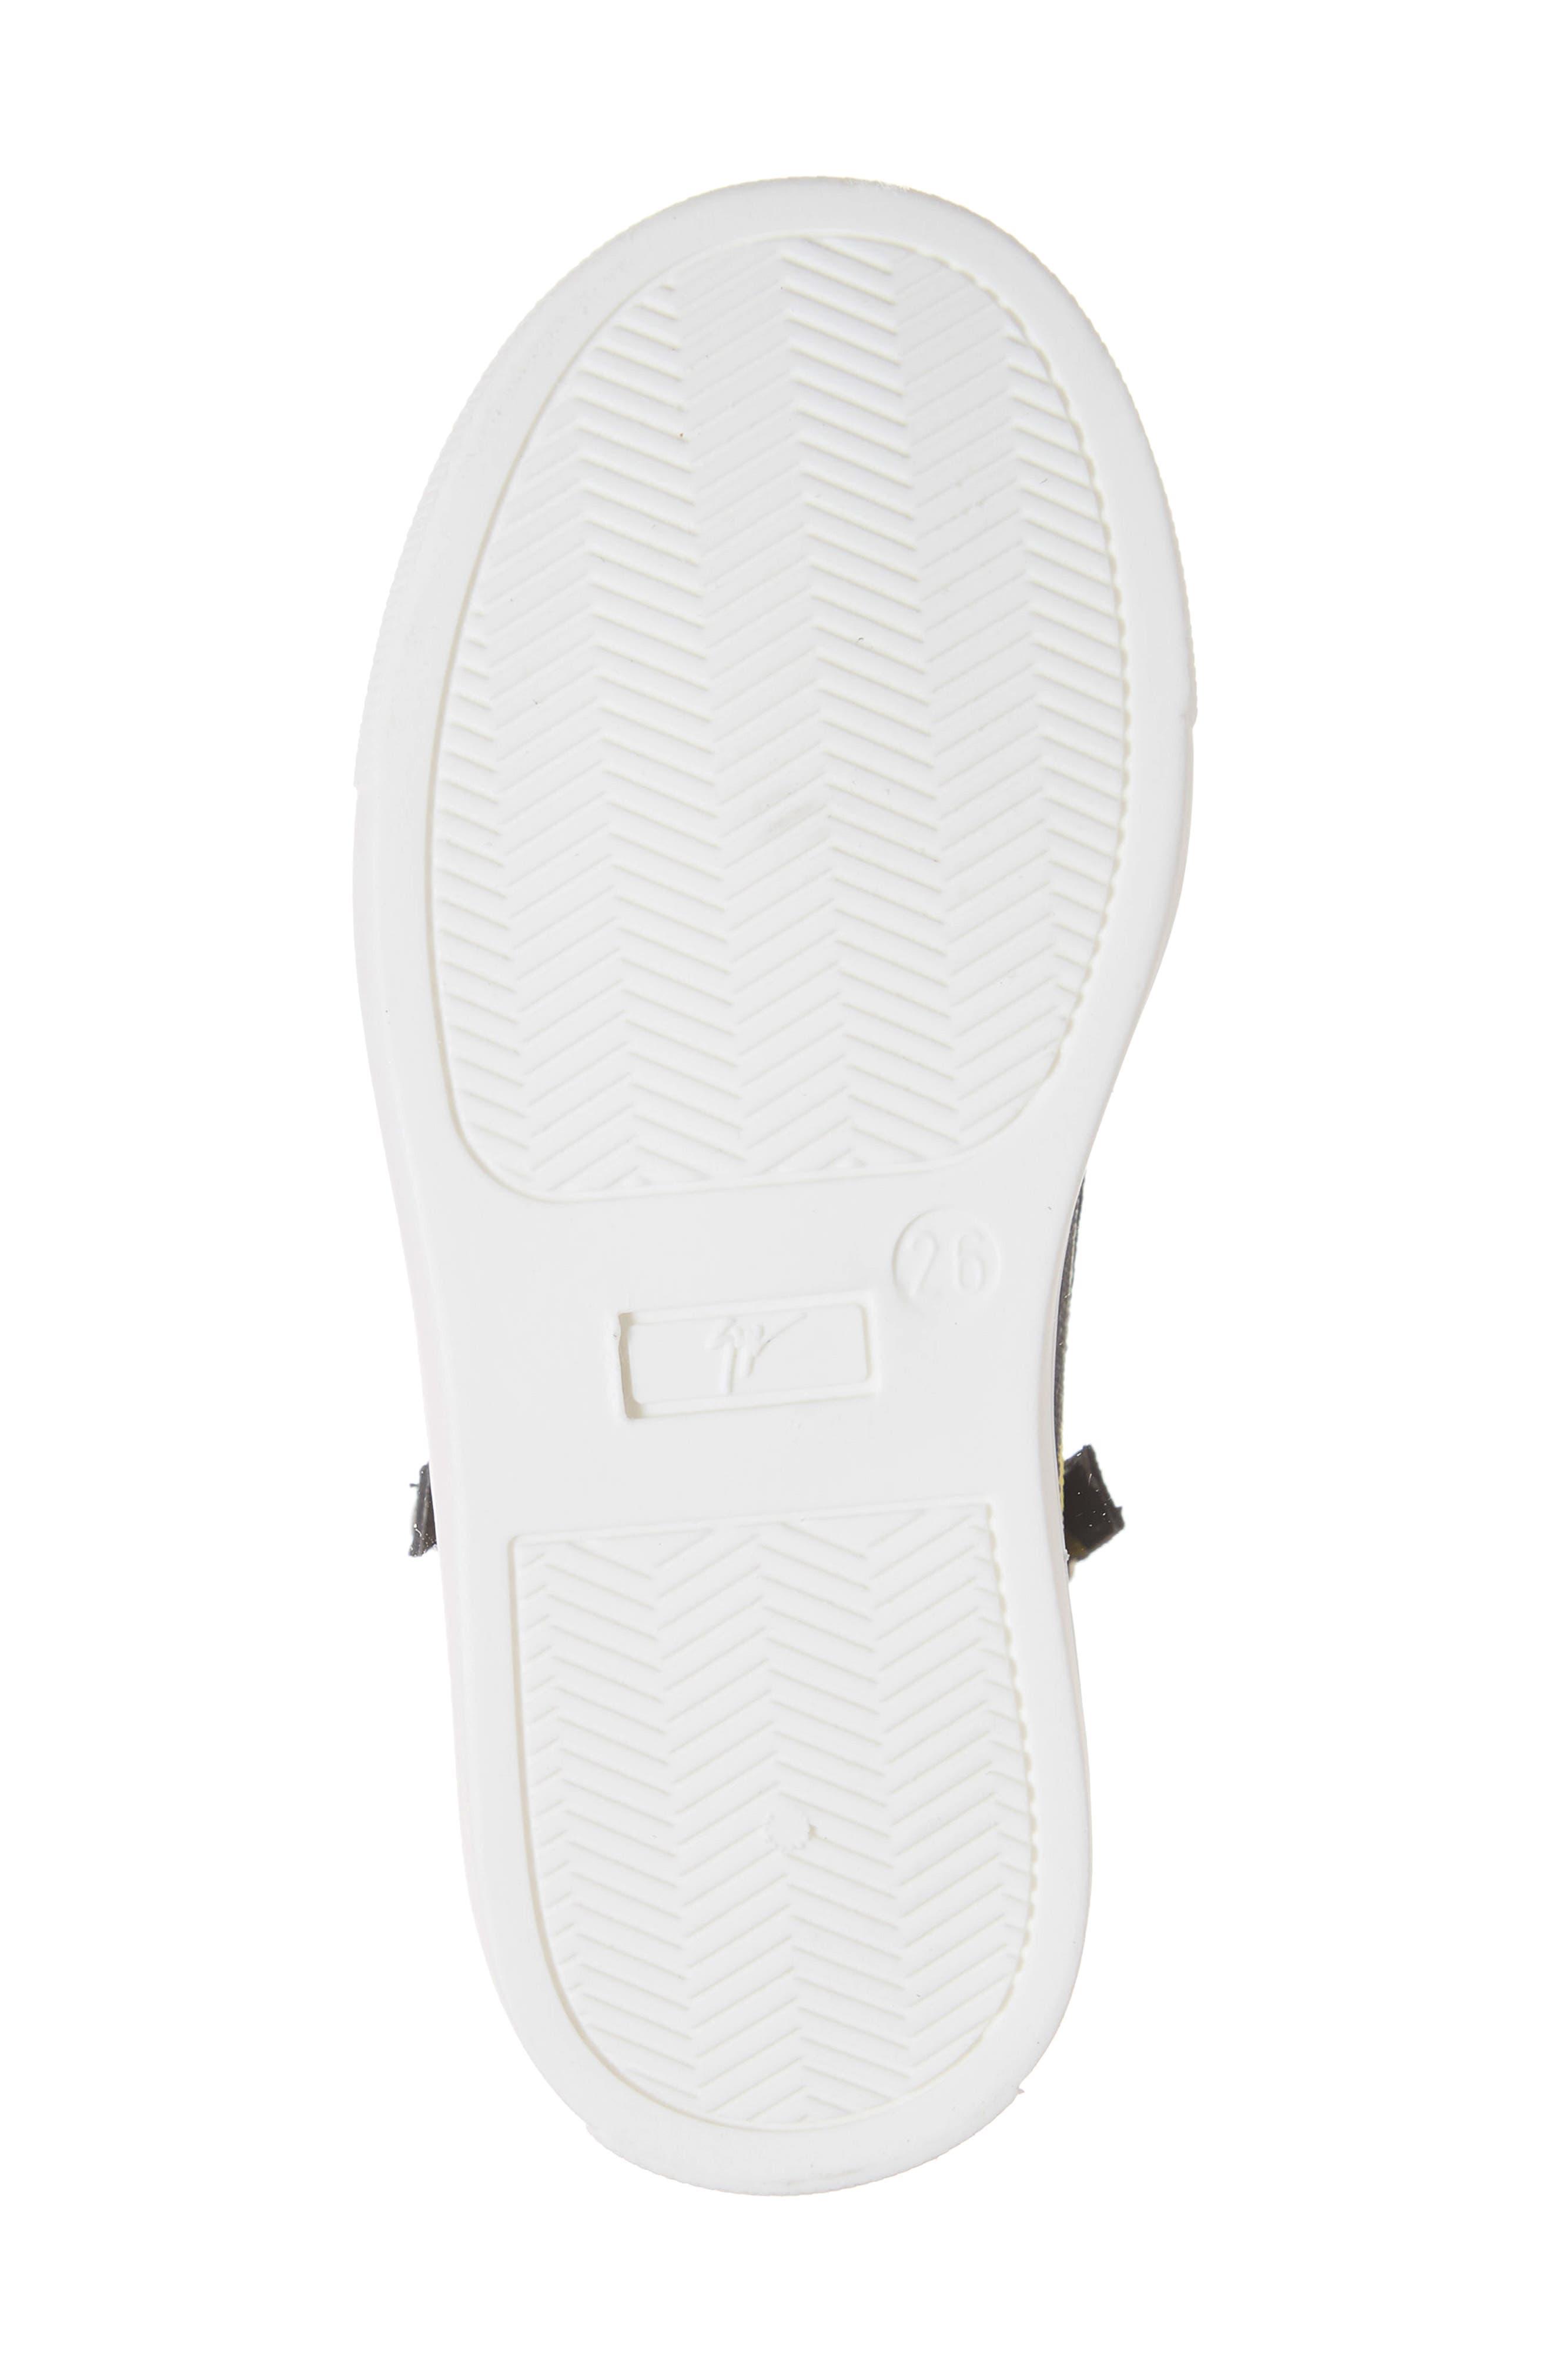 GIUSEPPE ZANOTTI, Kidlondon Banana Print Sneaker, Alternate thumbnail 6, color, BANANAS